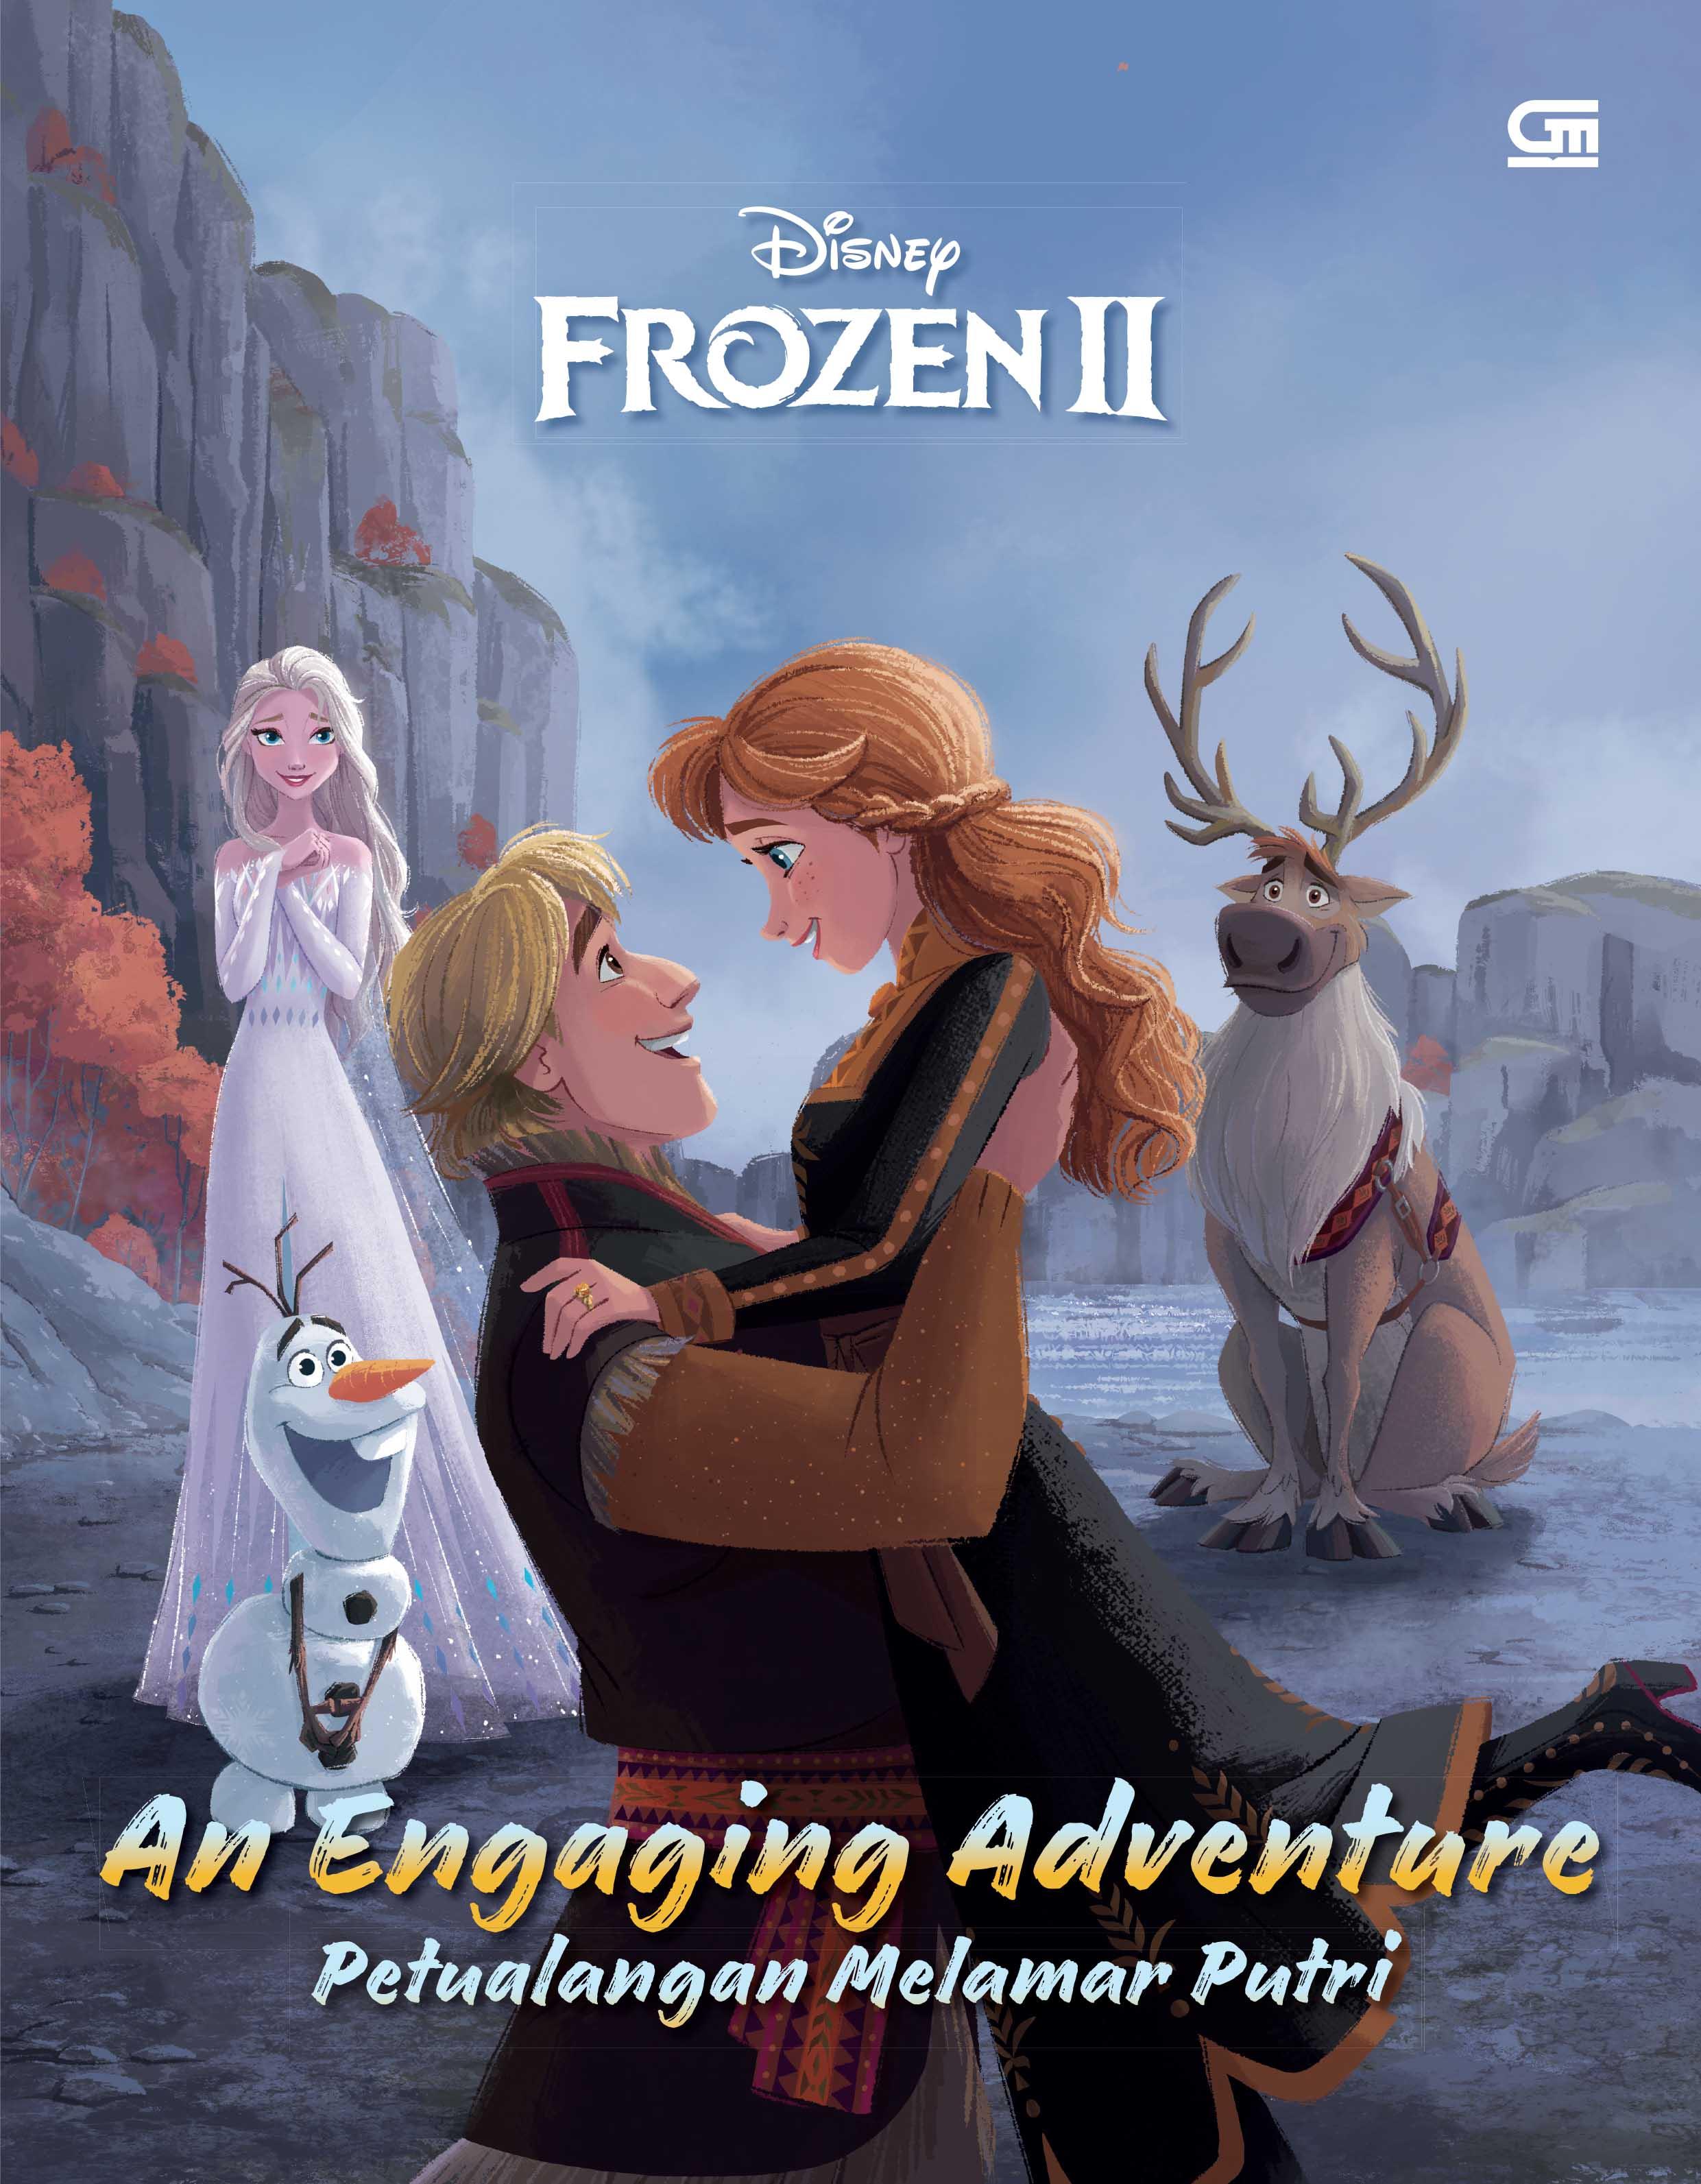 Frozen II: Petualangan Melamar Putri (An Engaging Adventure)